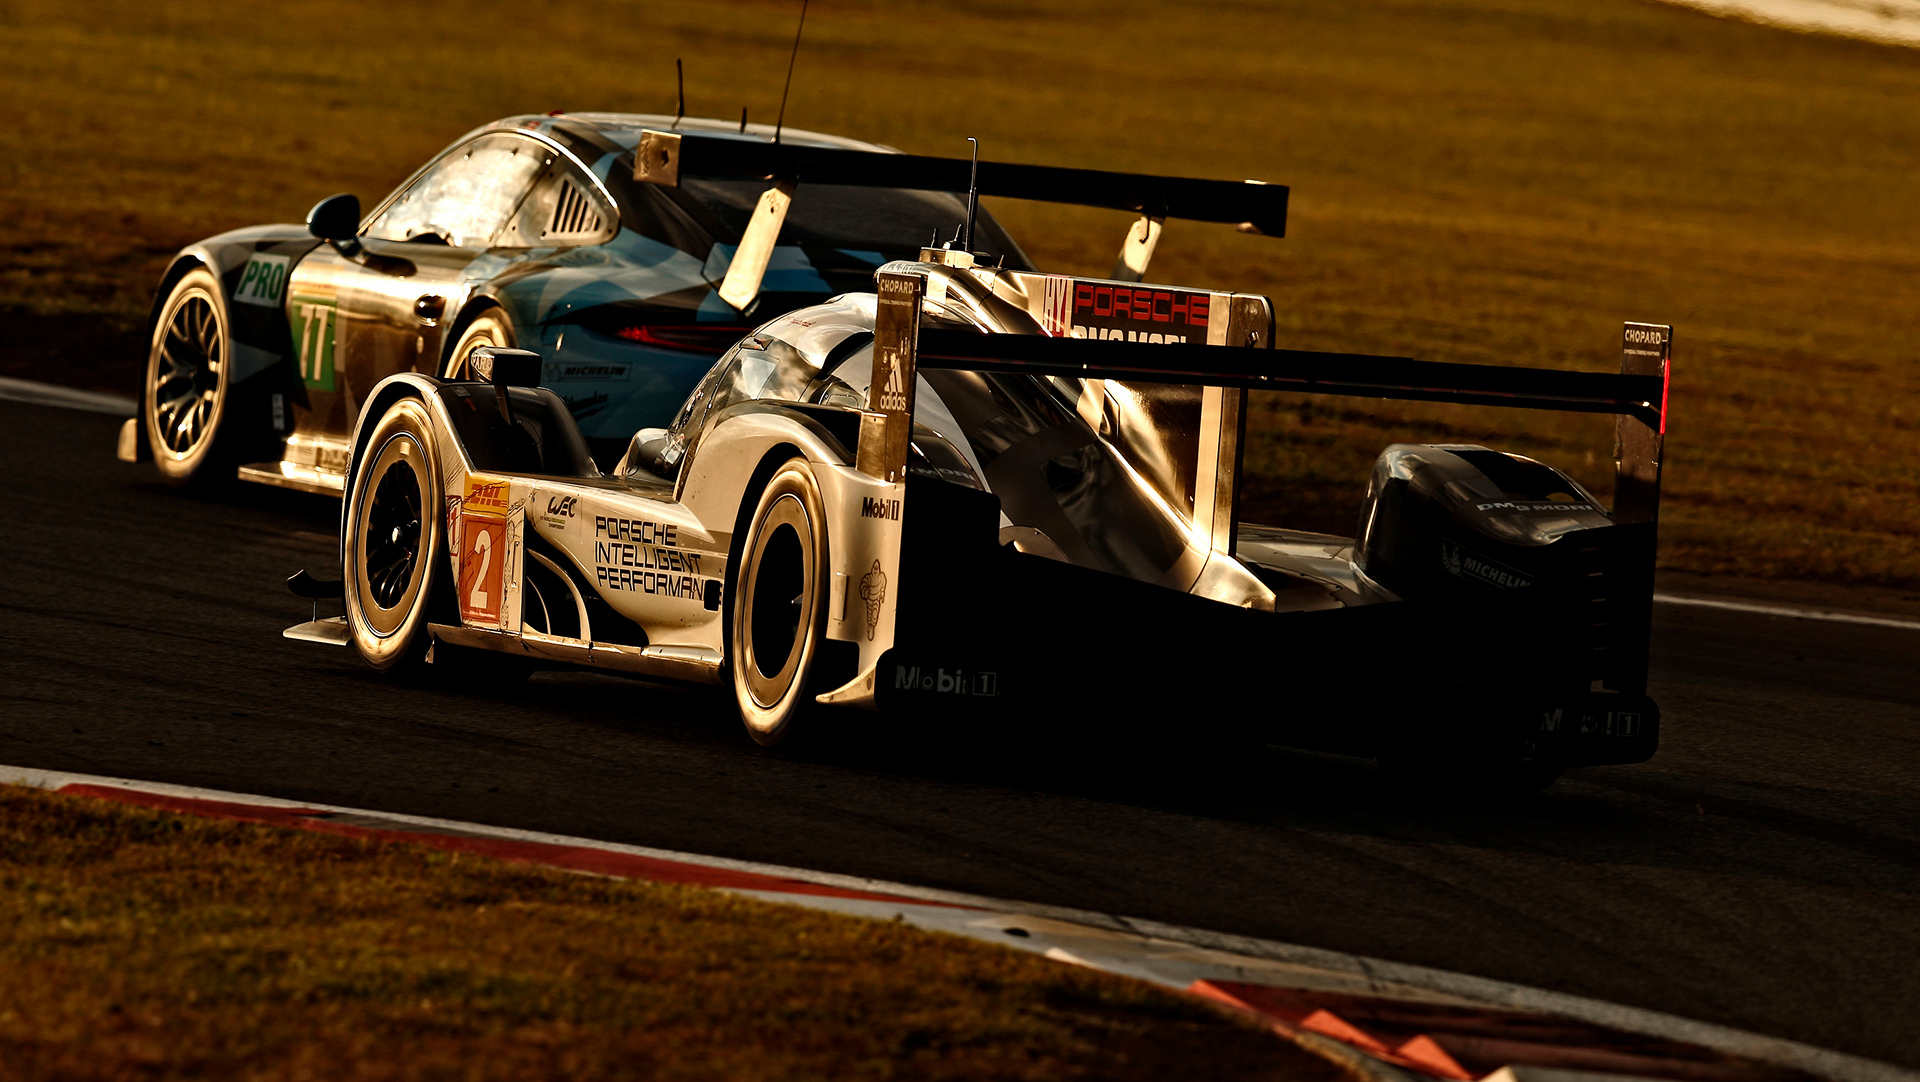 919 Hybrid, WEC, Fuji © Dr. Ing. h.c. F. Porsche AG